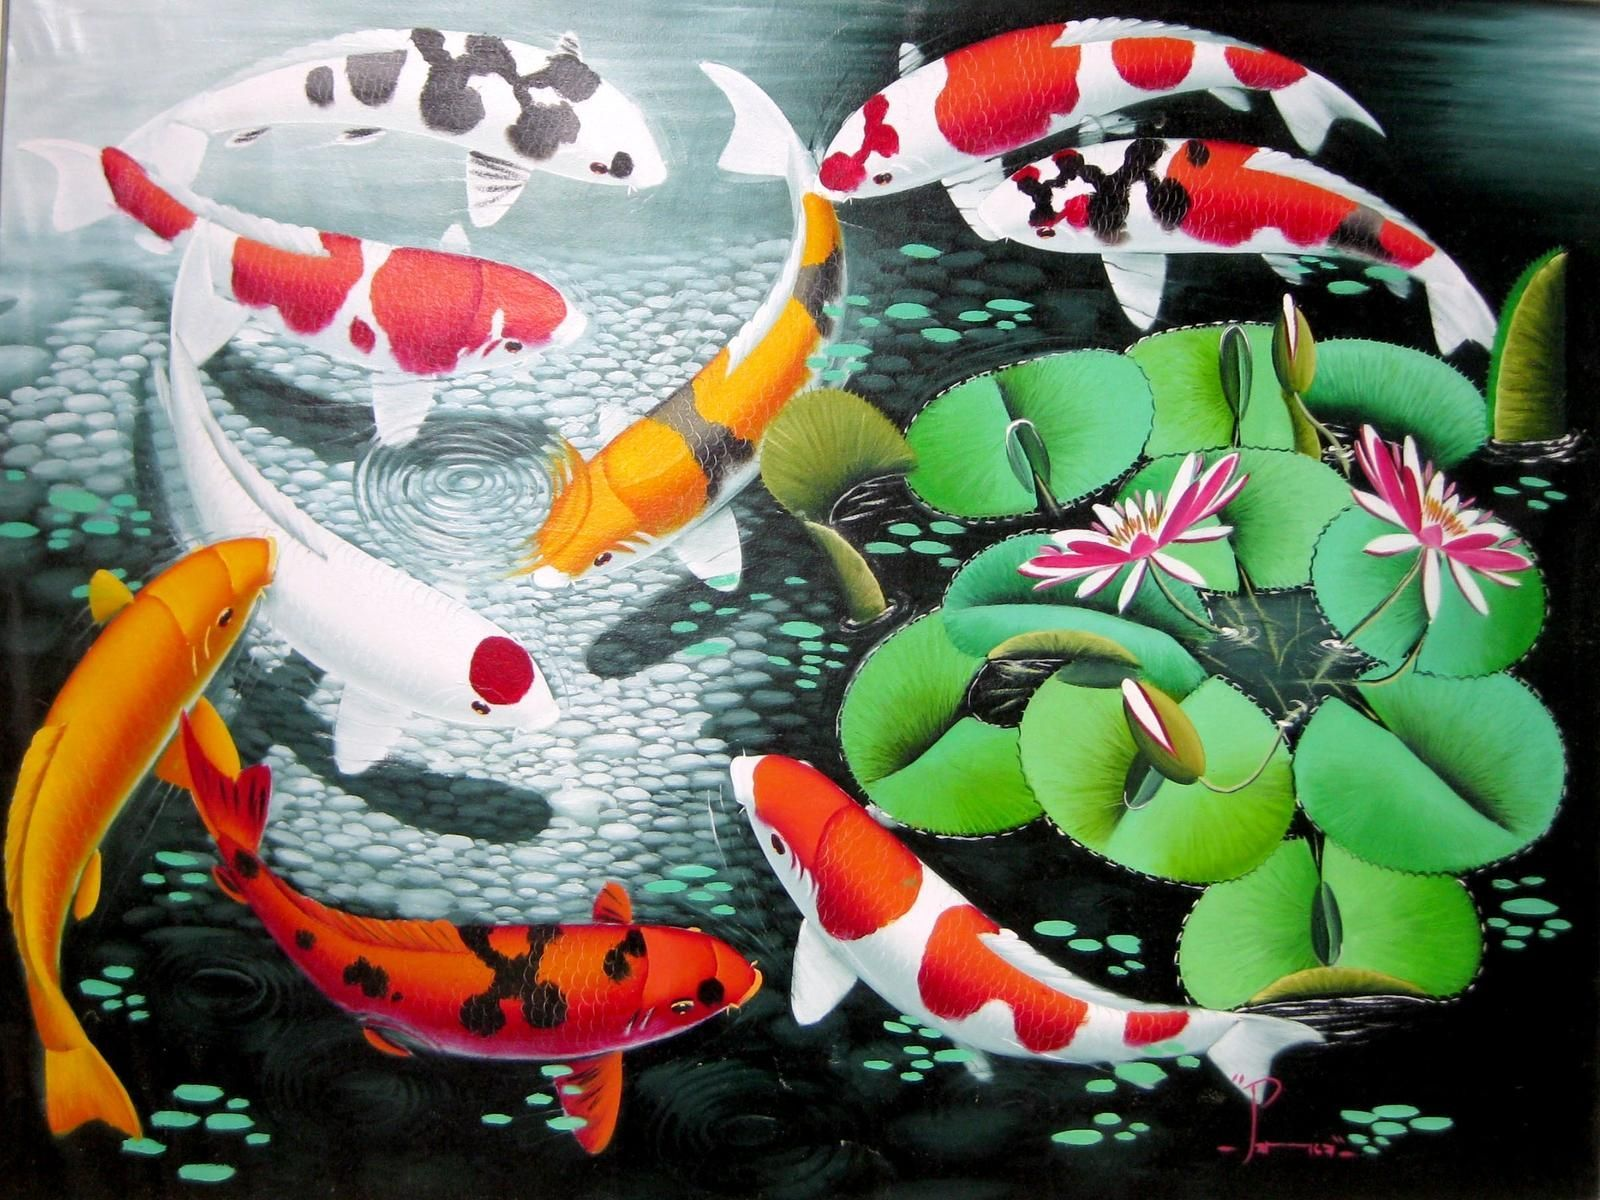 Japanese Koi Fish Wallpapers Top Free Japanese Koi Fish Backgrounds Wallpaperaccess